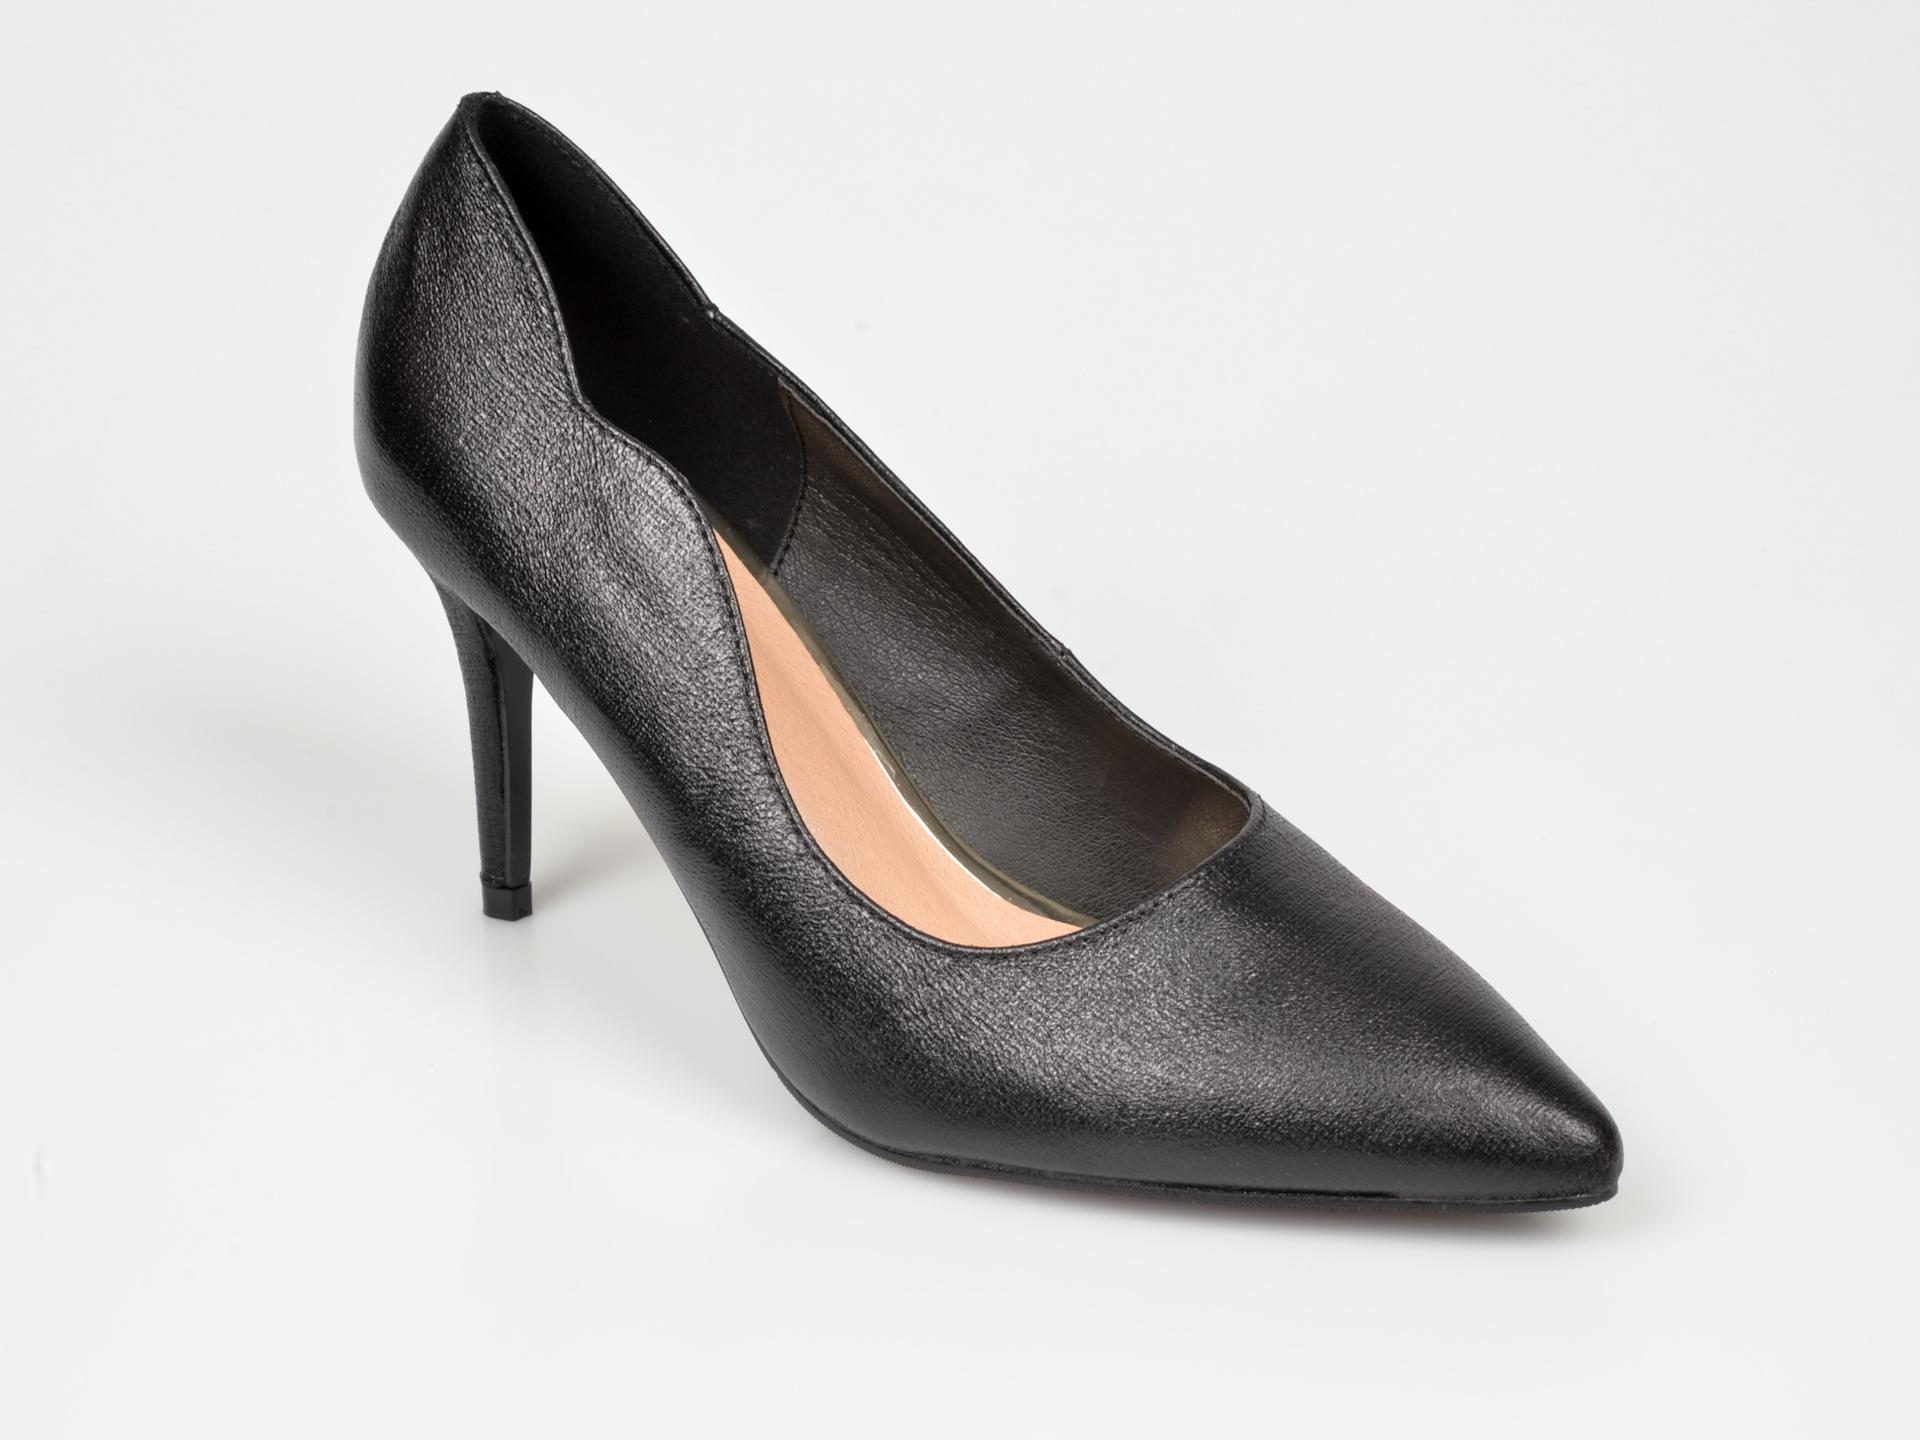 Pantofi Menbur Negri, 20901, Din Piele Ecologica